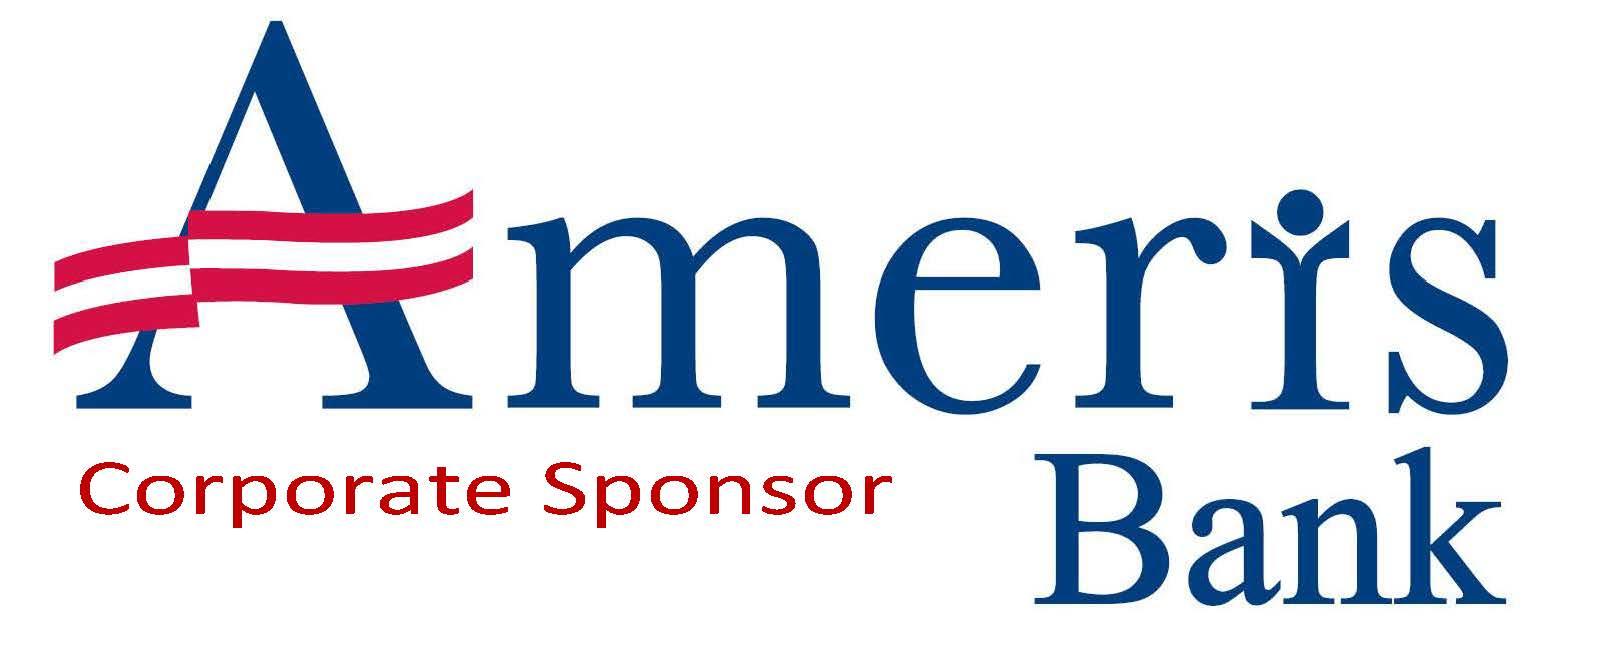 AmerisBank Sponsor Logo